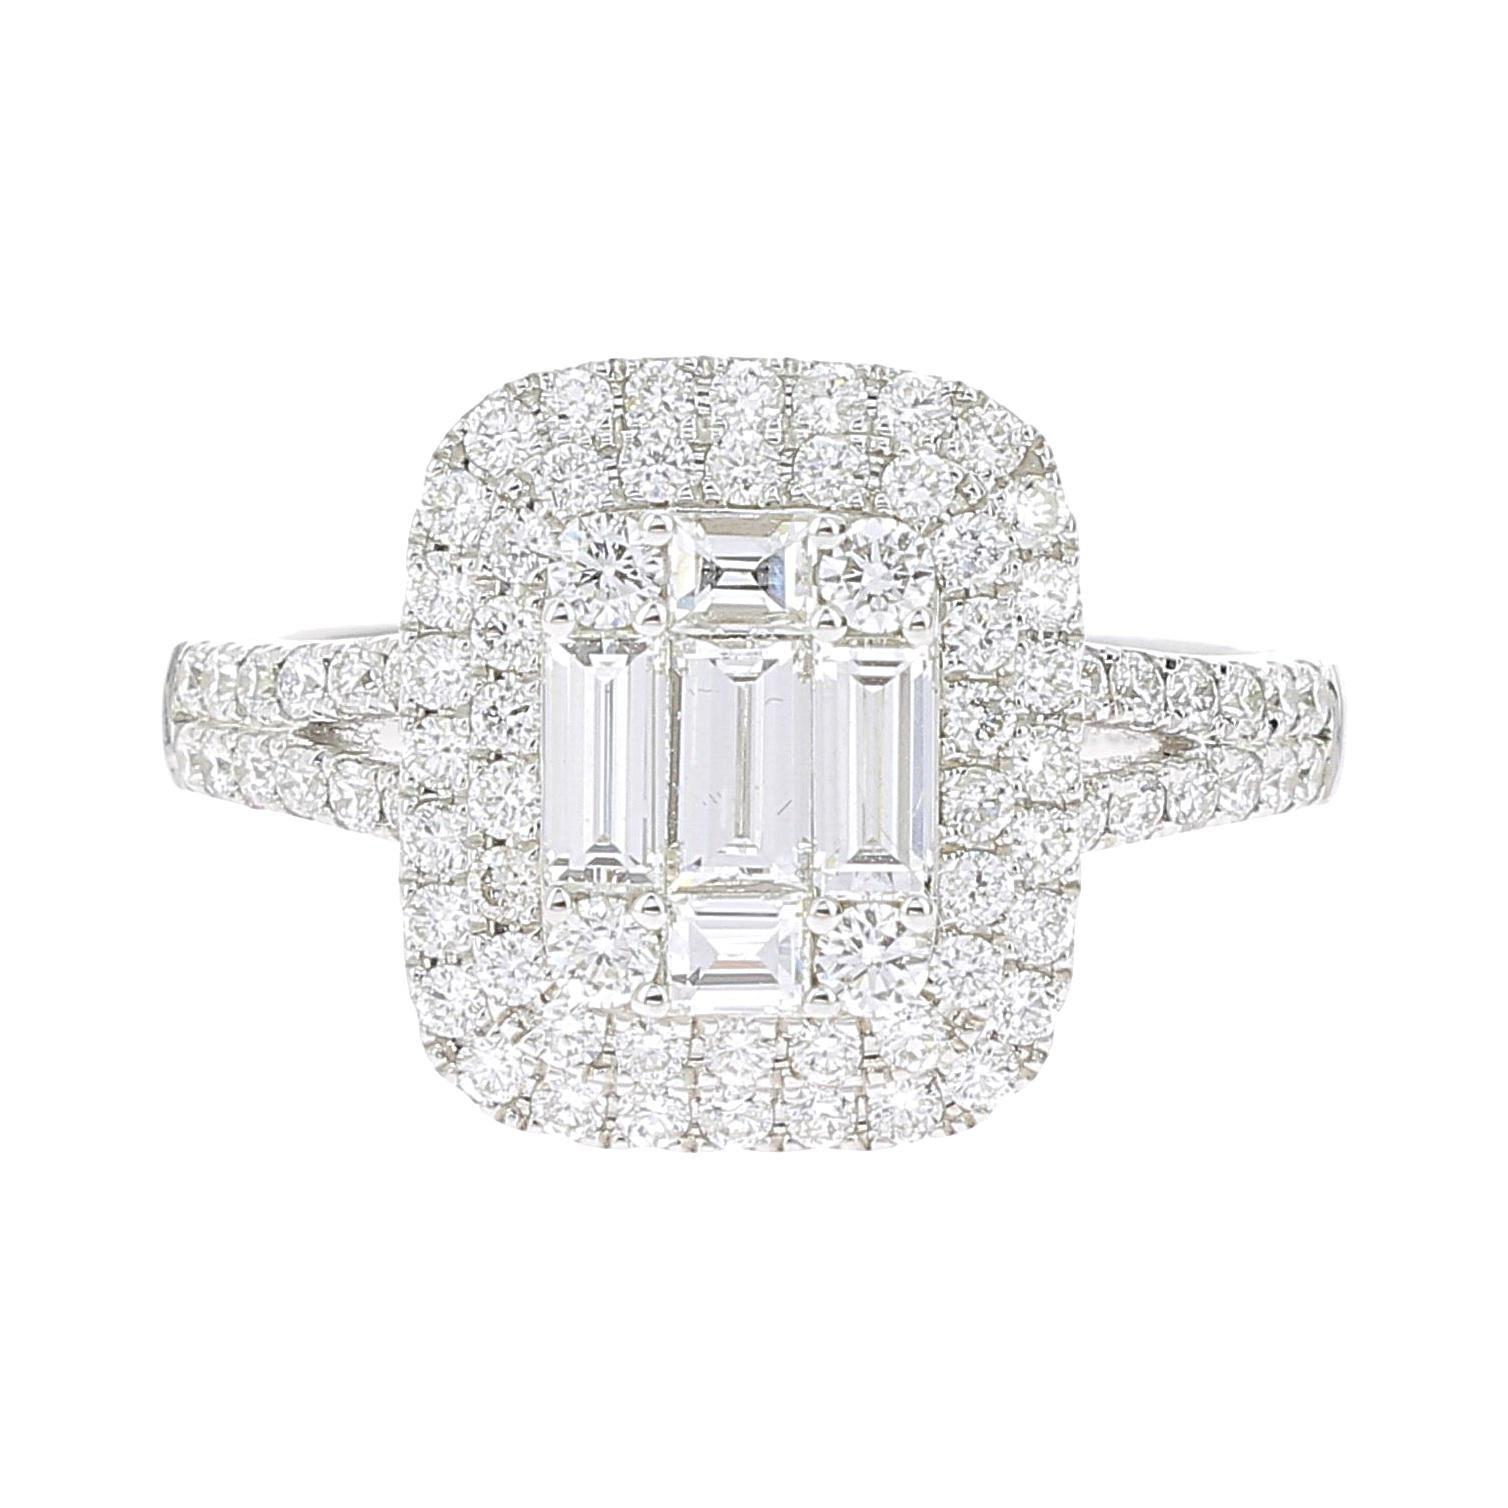 732578a32e9bdf 1.11 Carat Emerald Cut Illusion Diamond Ring Baguette-Cut-Diamond 18 Karat  at 1stdibs